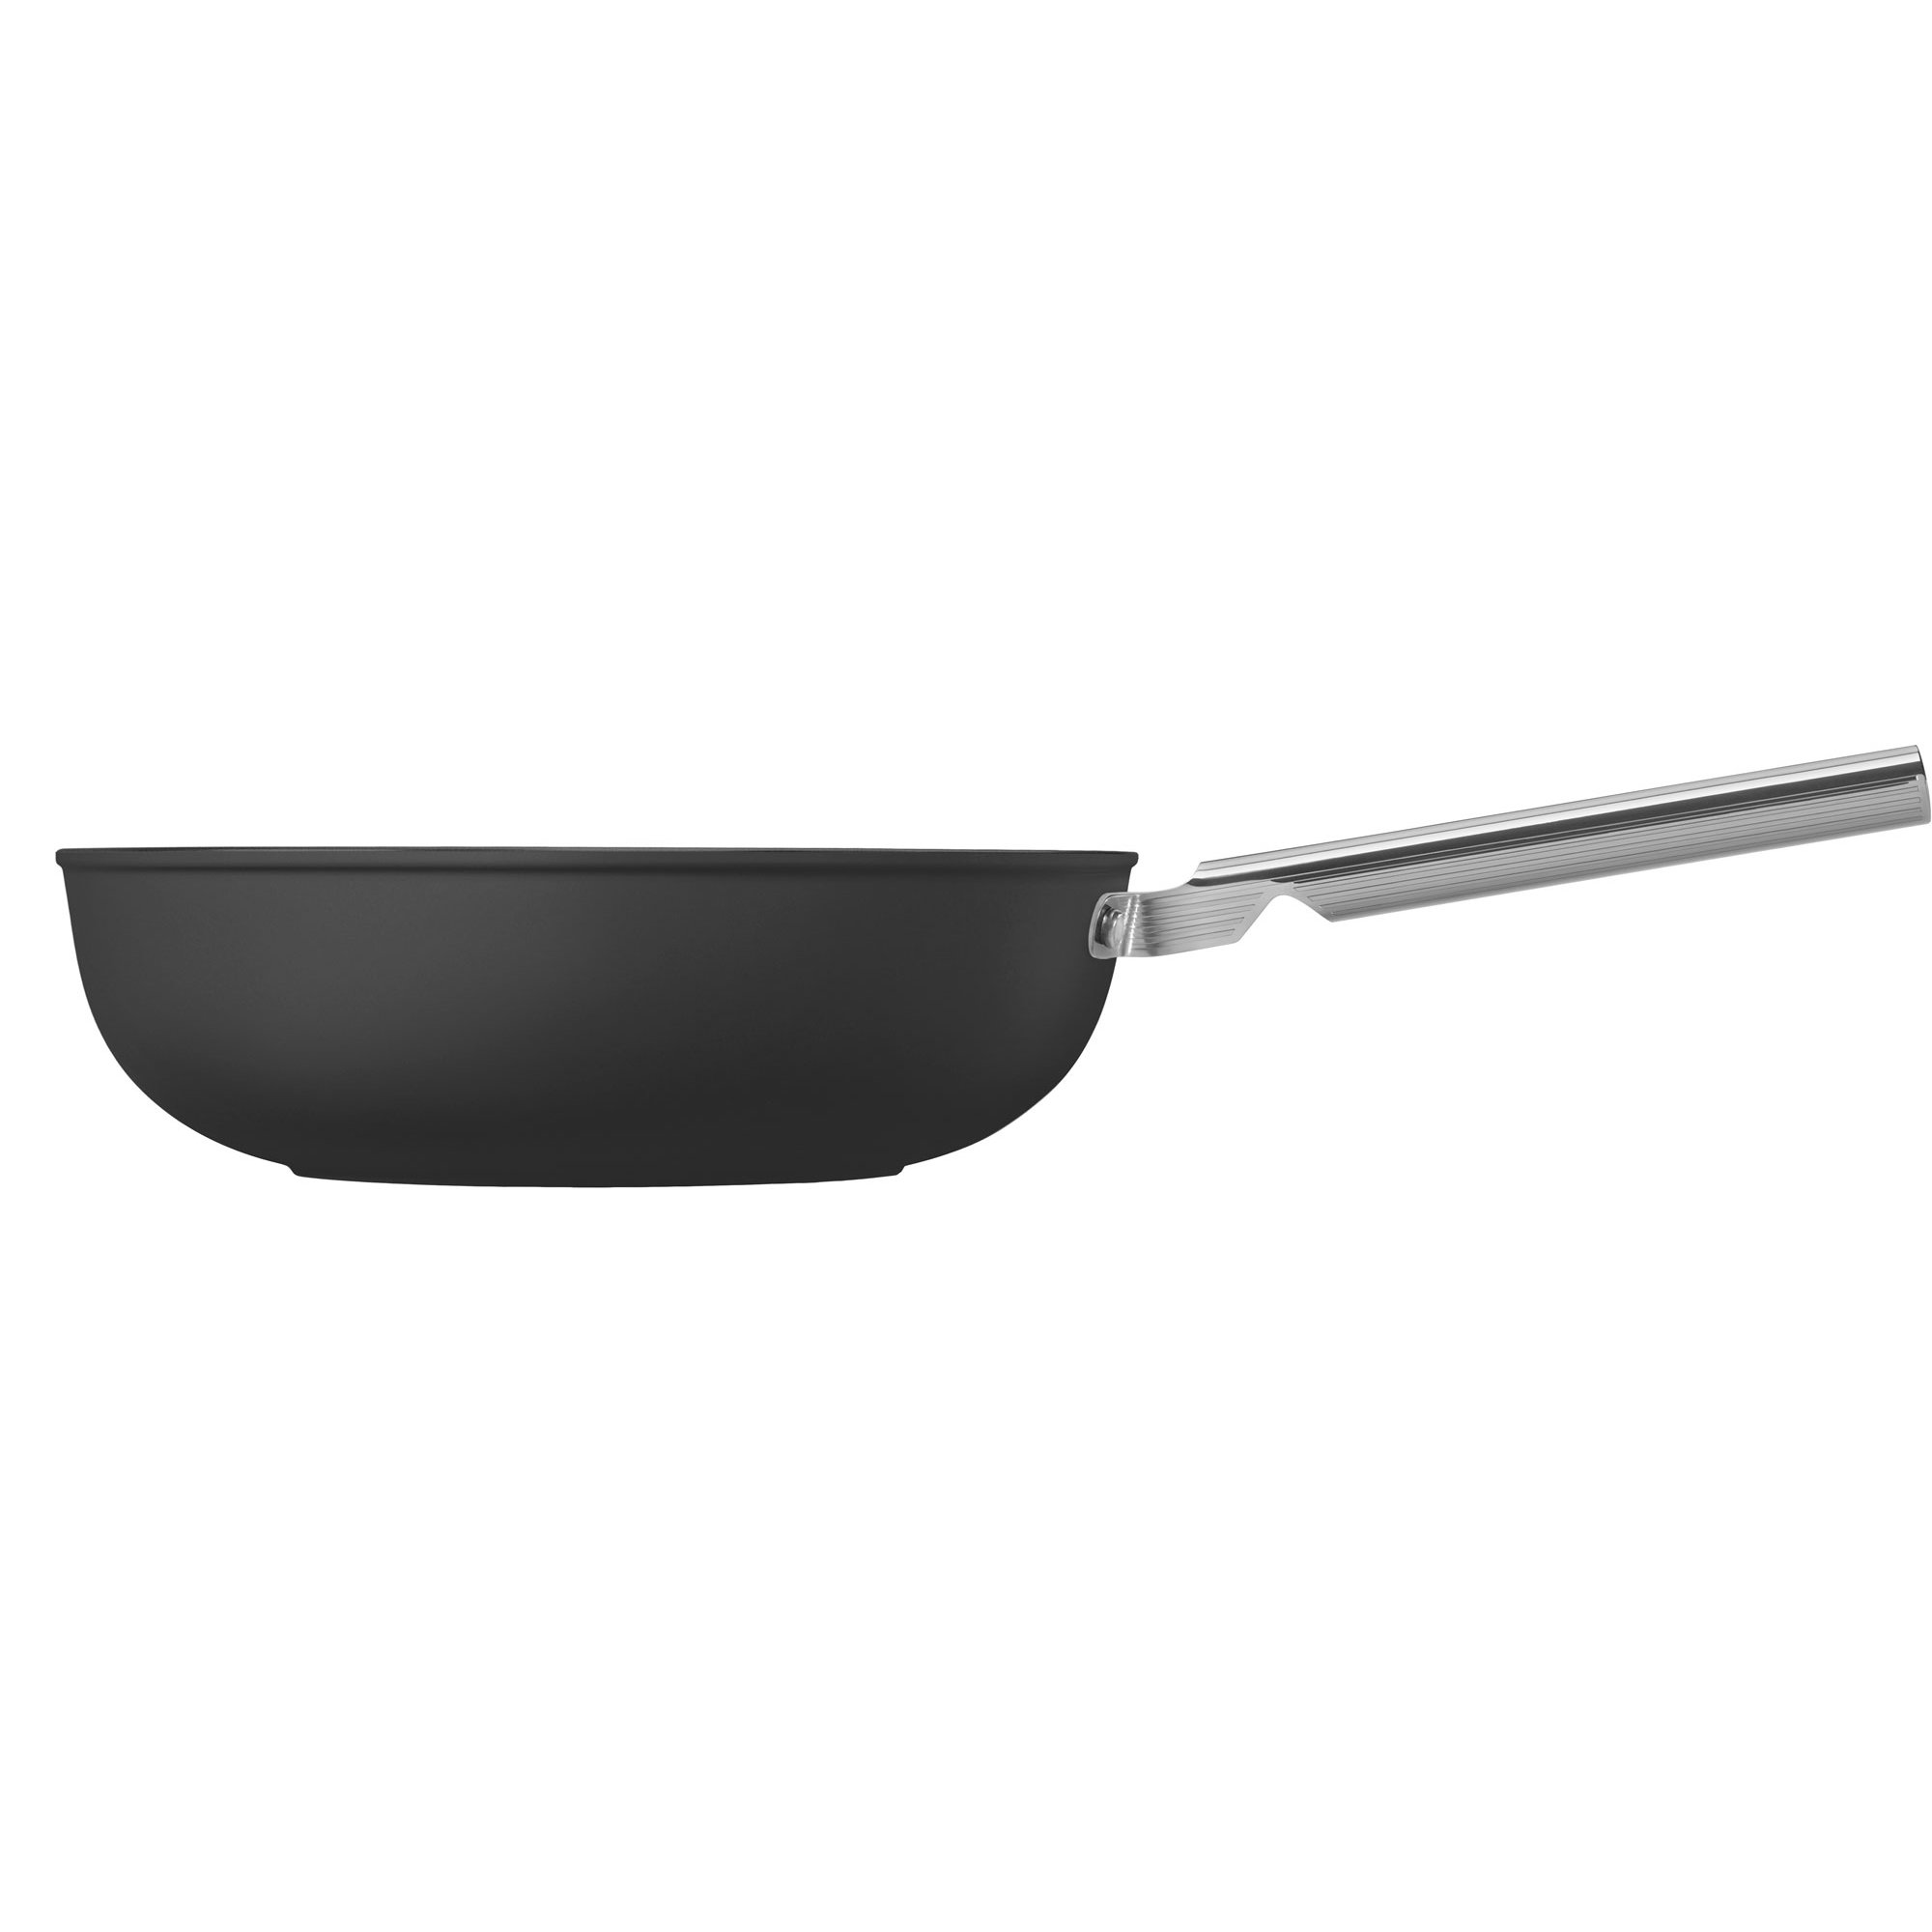 Smeg Wokpanna 30 cm svart